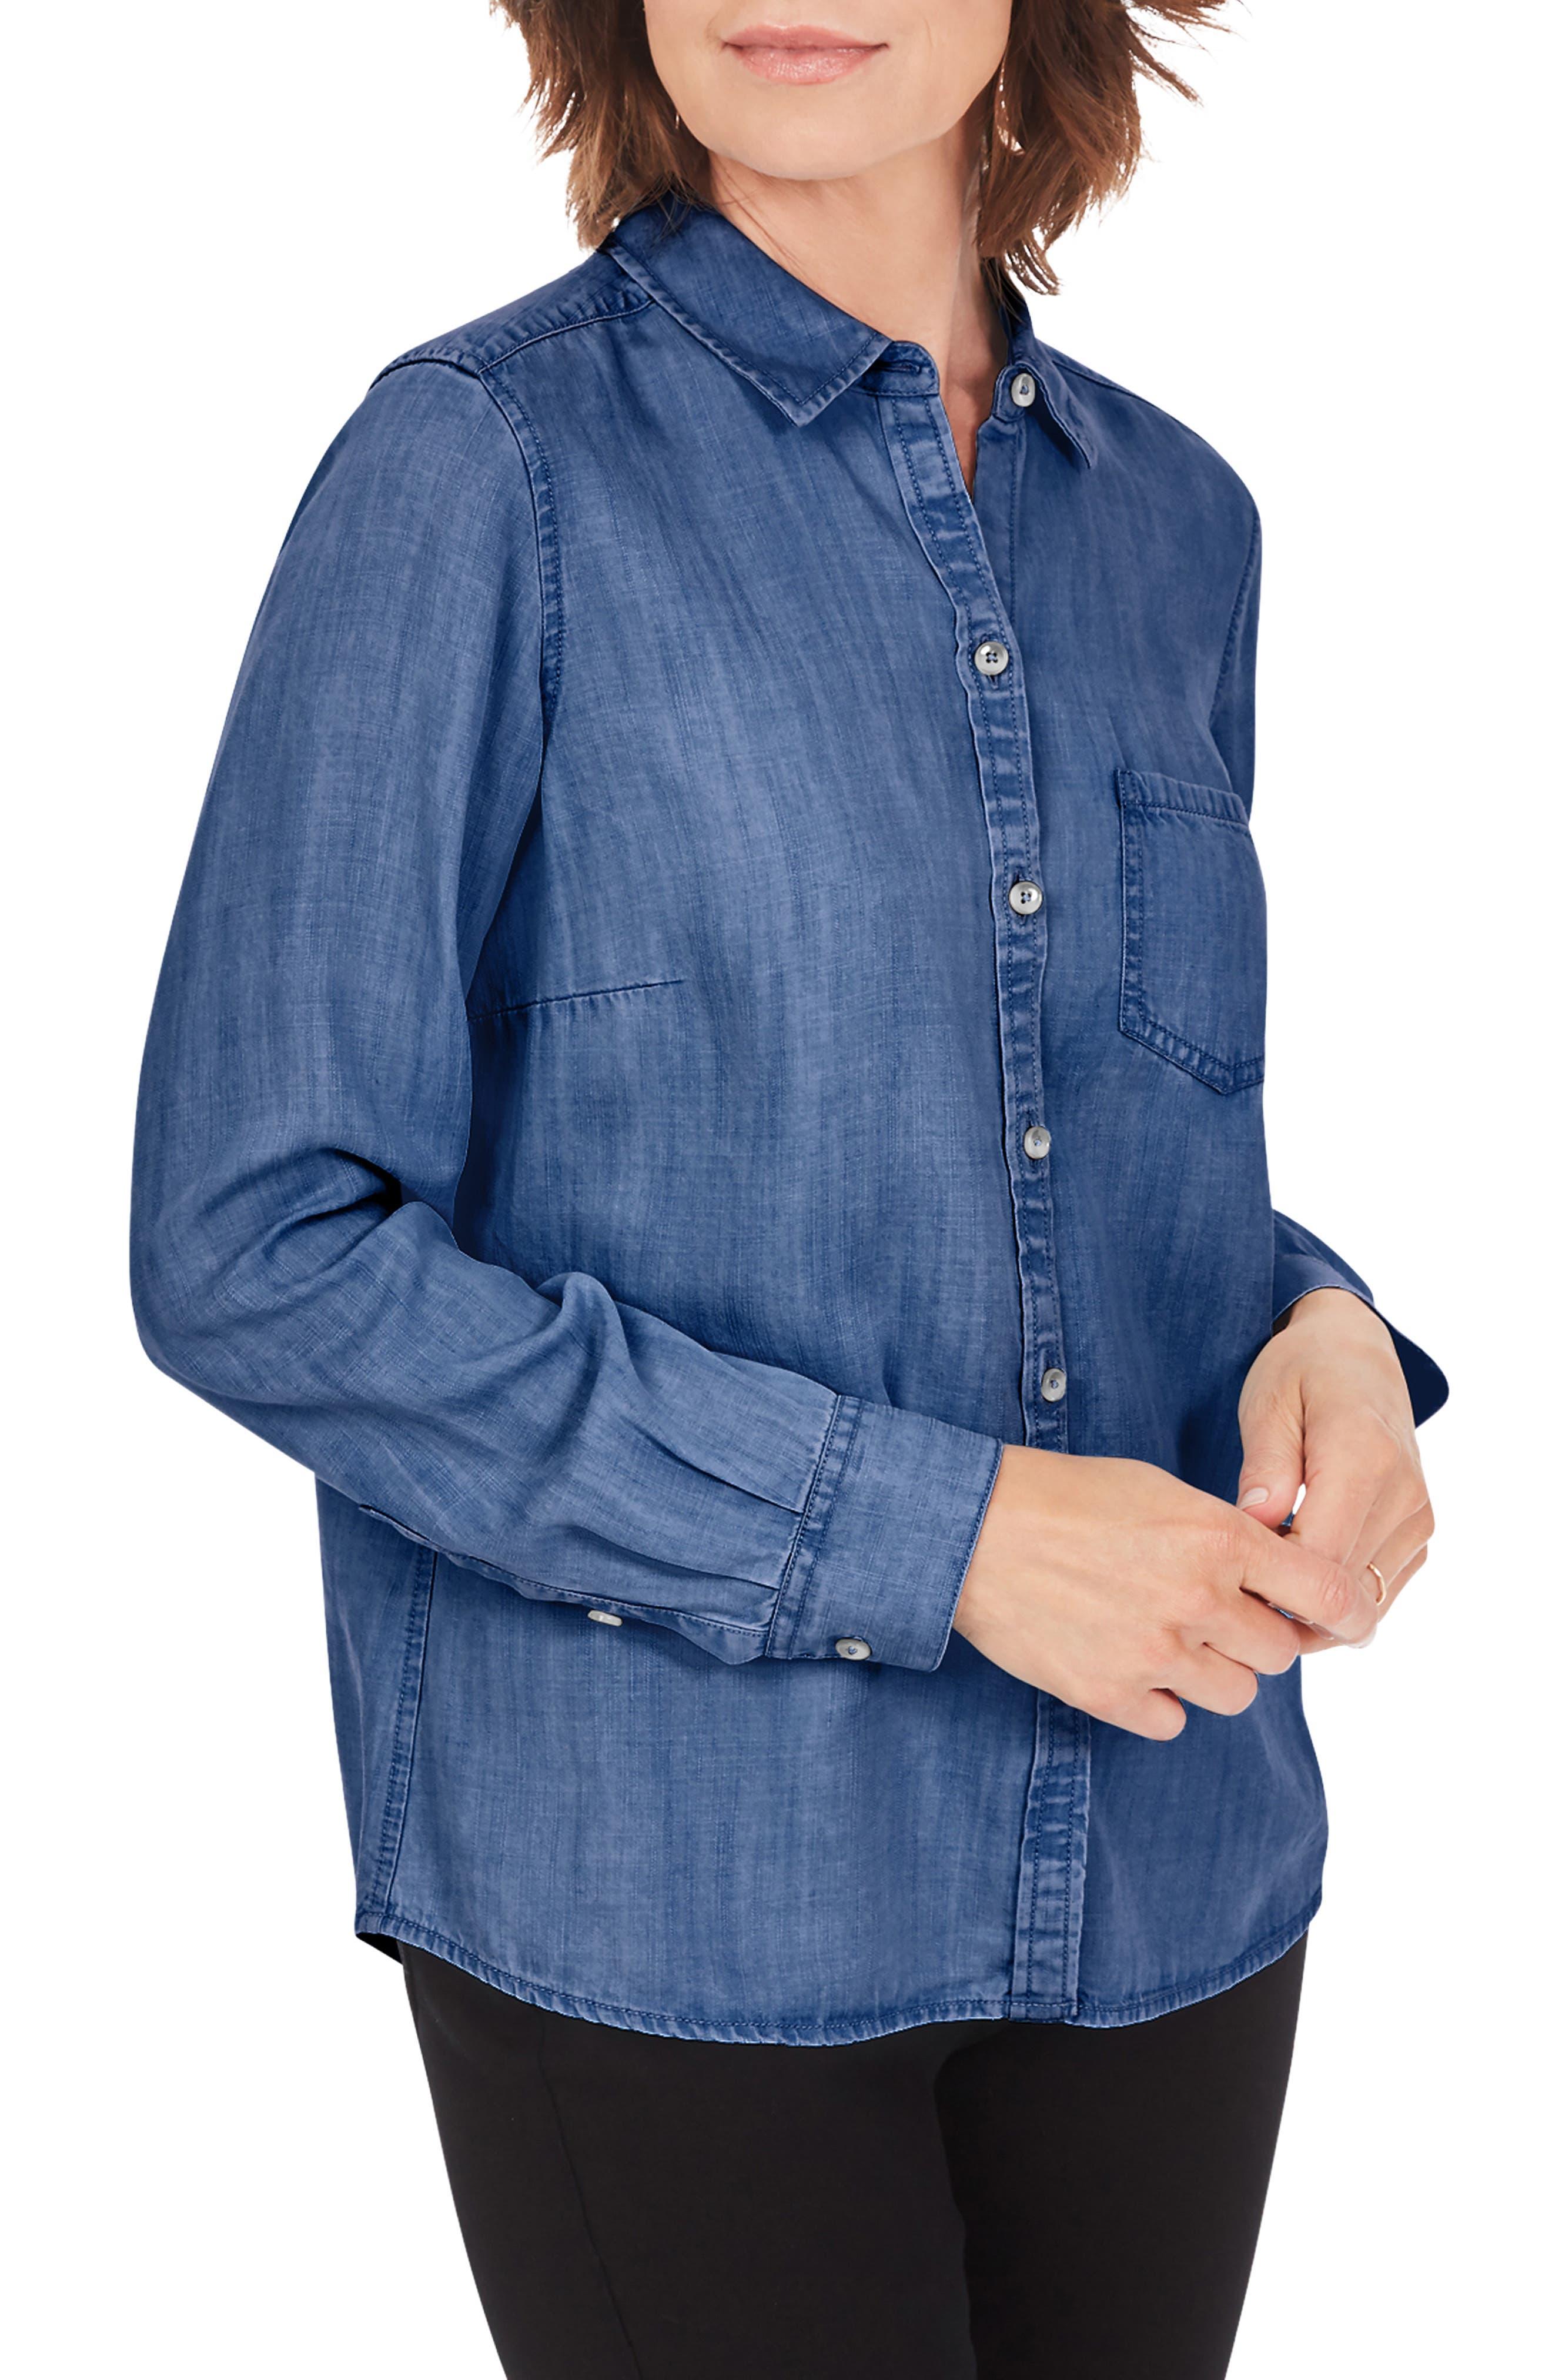 The Hampton Chambray Button-Up Shirt